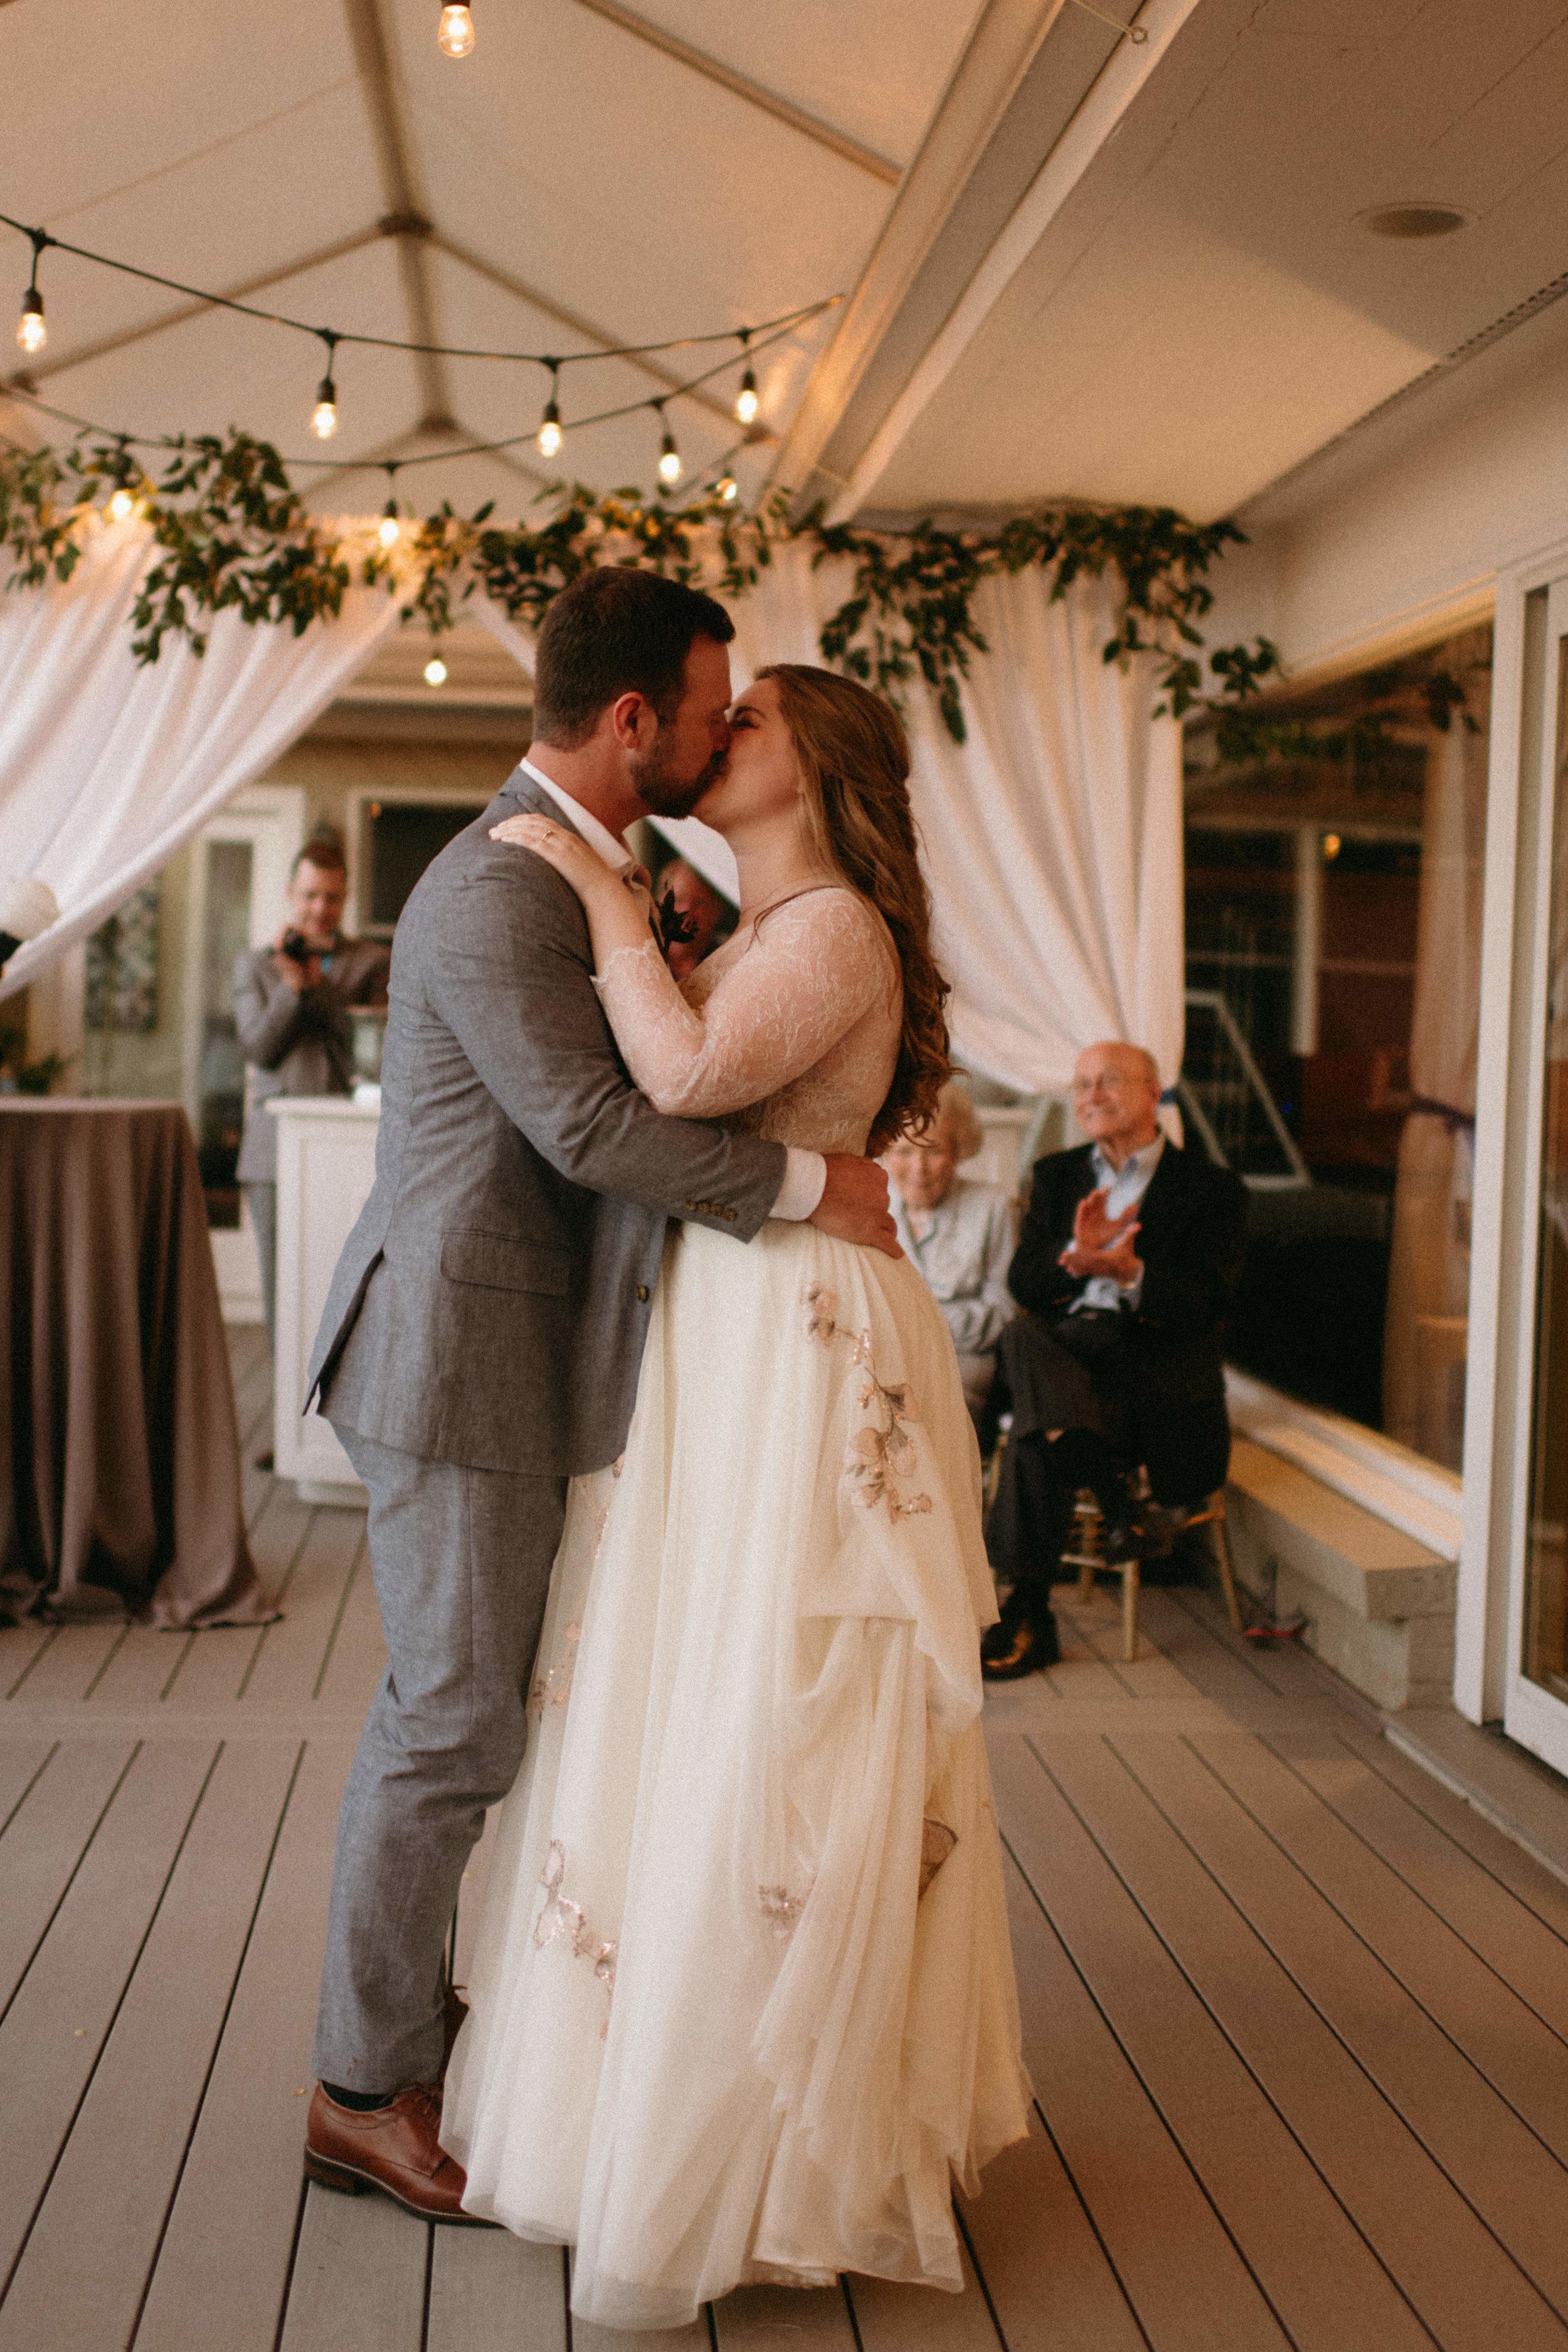 Elizabeth and Aldens Intimate Backyard wedding in Nashville Tennessee Wedding Photographer00022.jpg